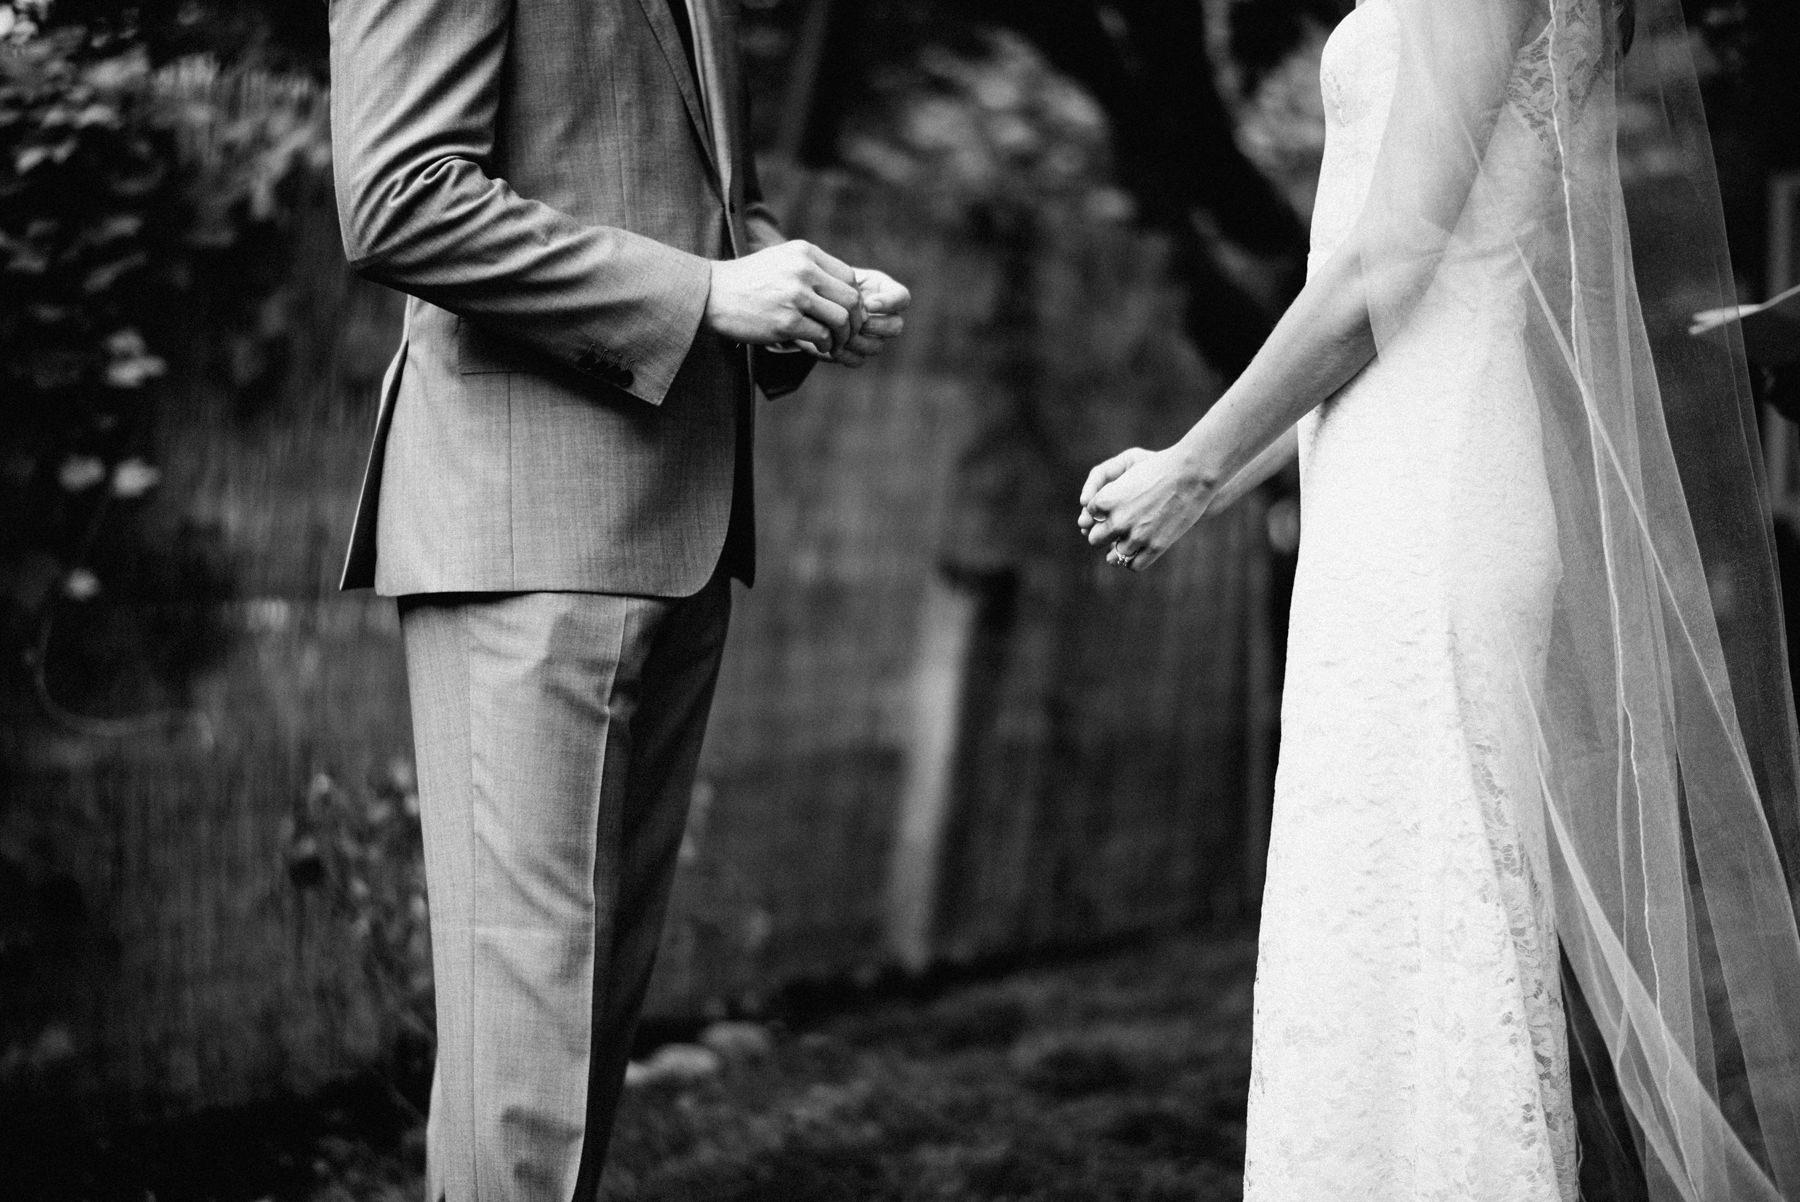 213-outdoor-wedding-ceremony-at-the-corson-building.jpg